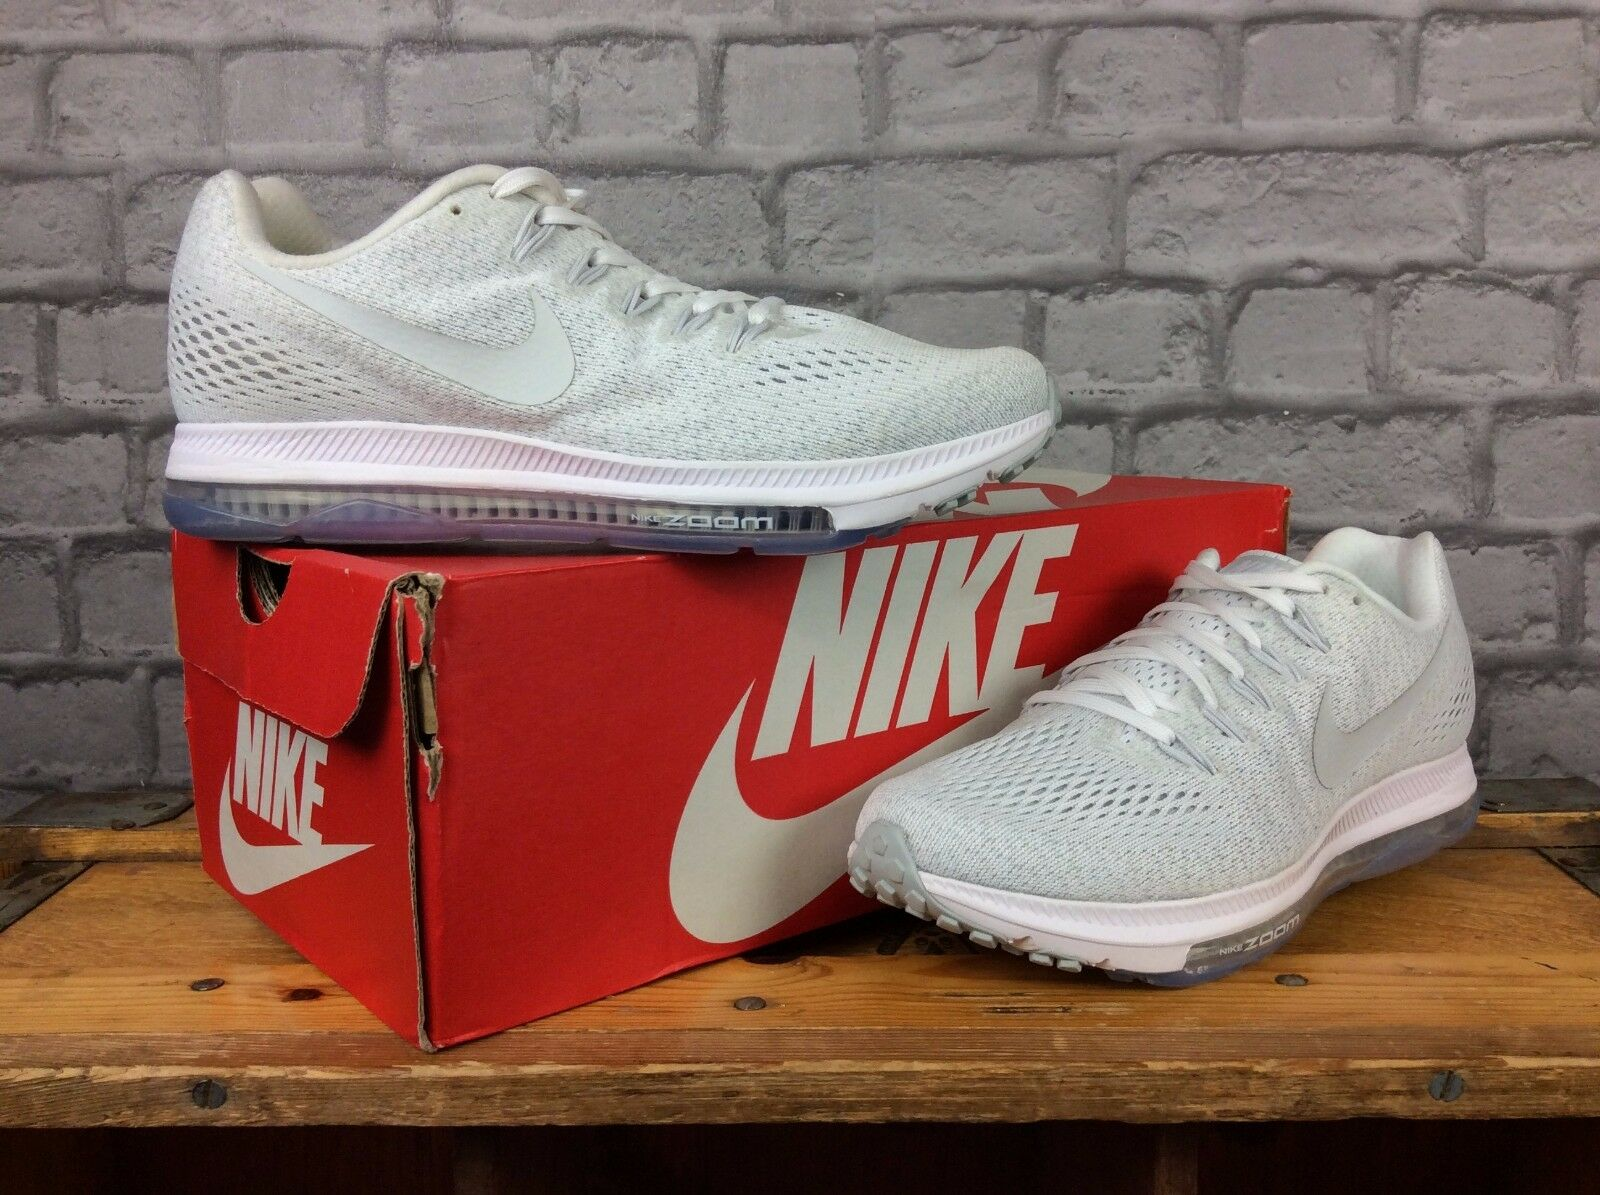 Nike Zoom EUR 38.5 Da Donna Performance Bianco Platino puro Scarpe Da Ginnastica